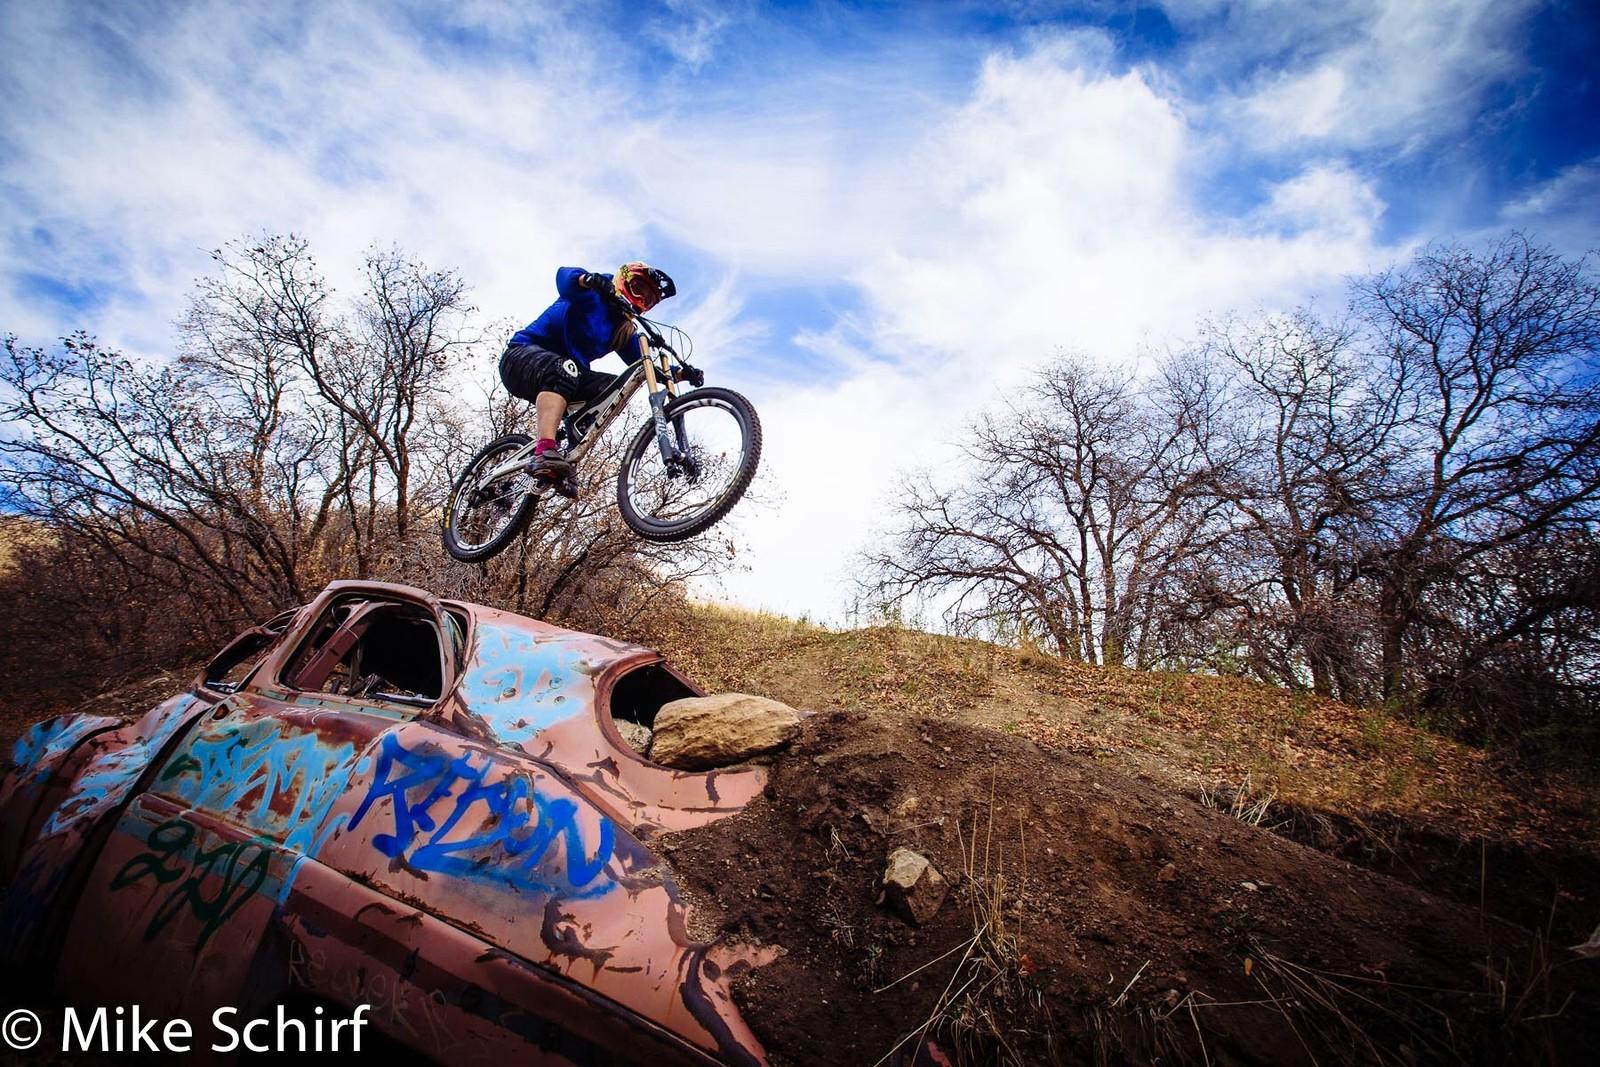 Fender Bender - ambatty - Mountain Biking Pictures - Vital MTB